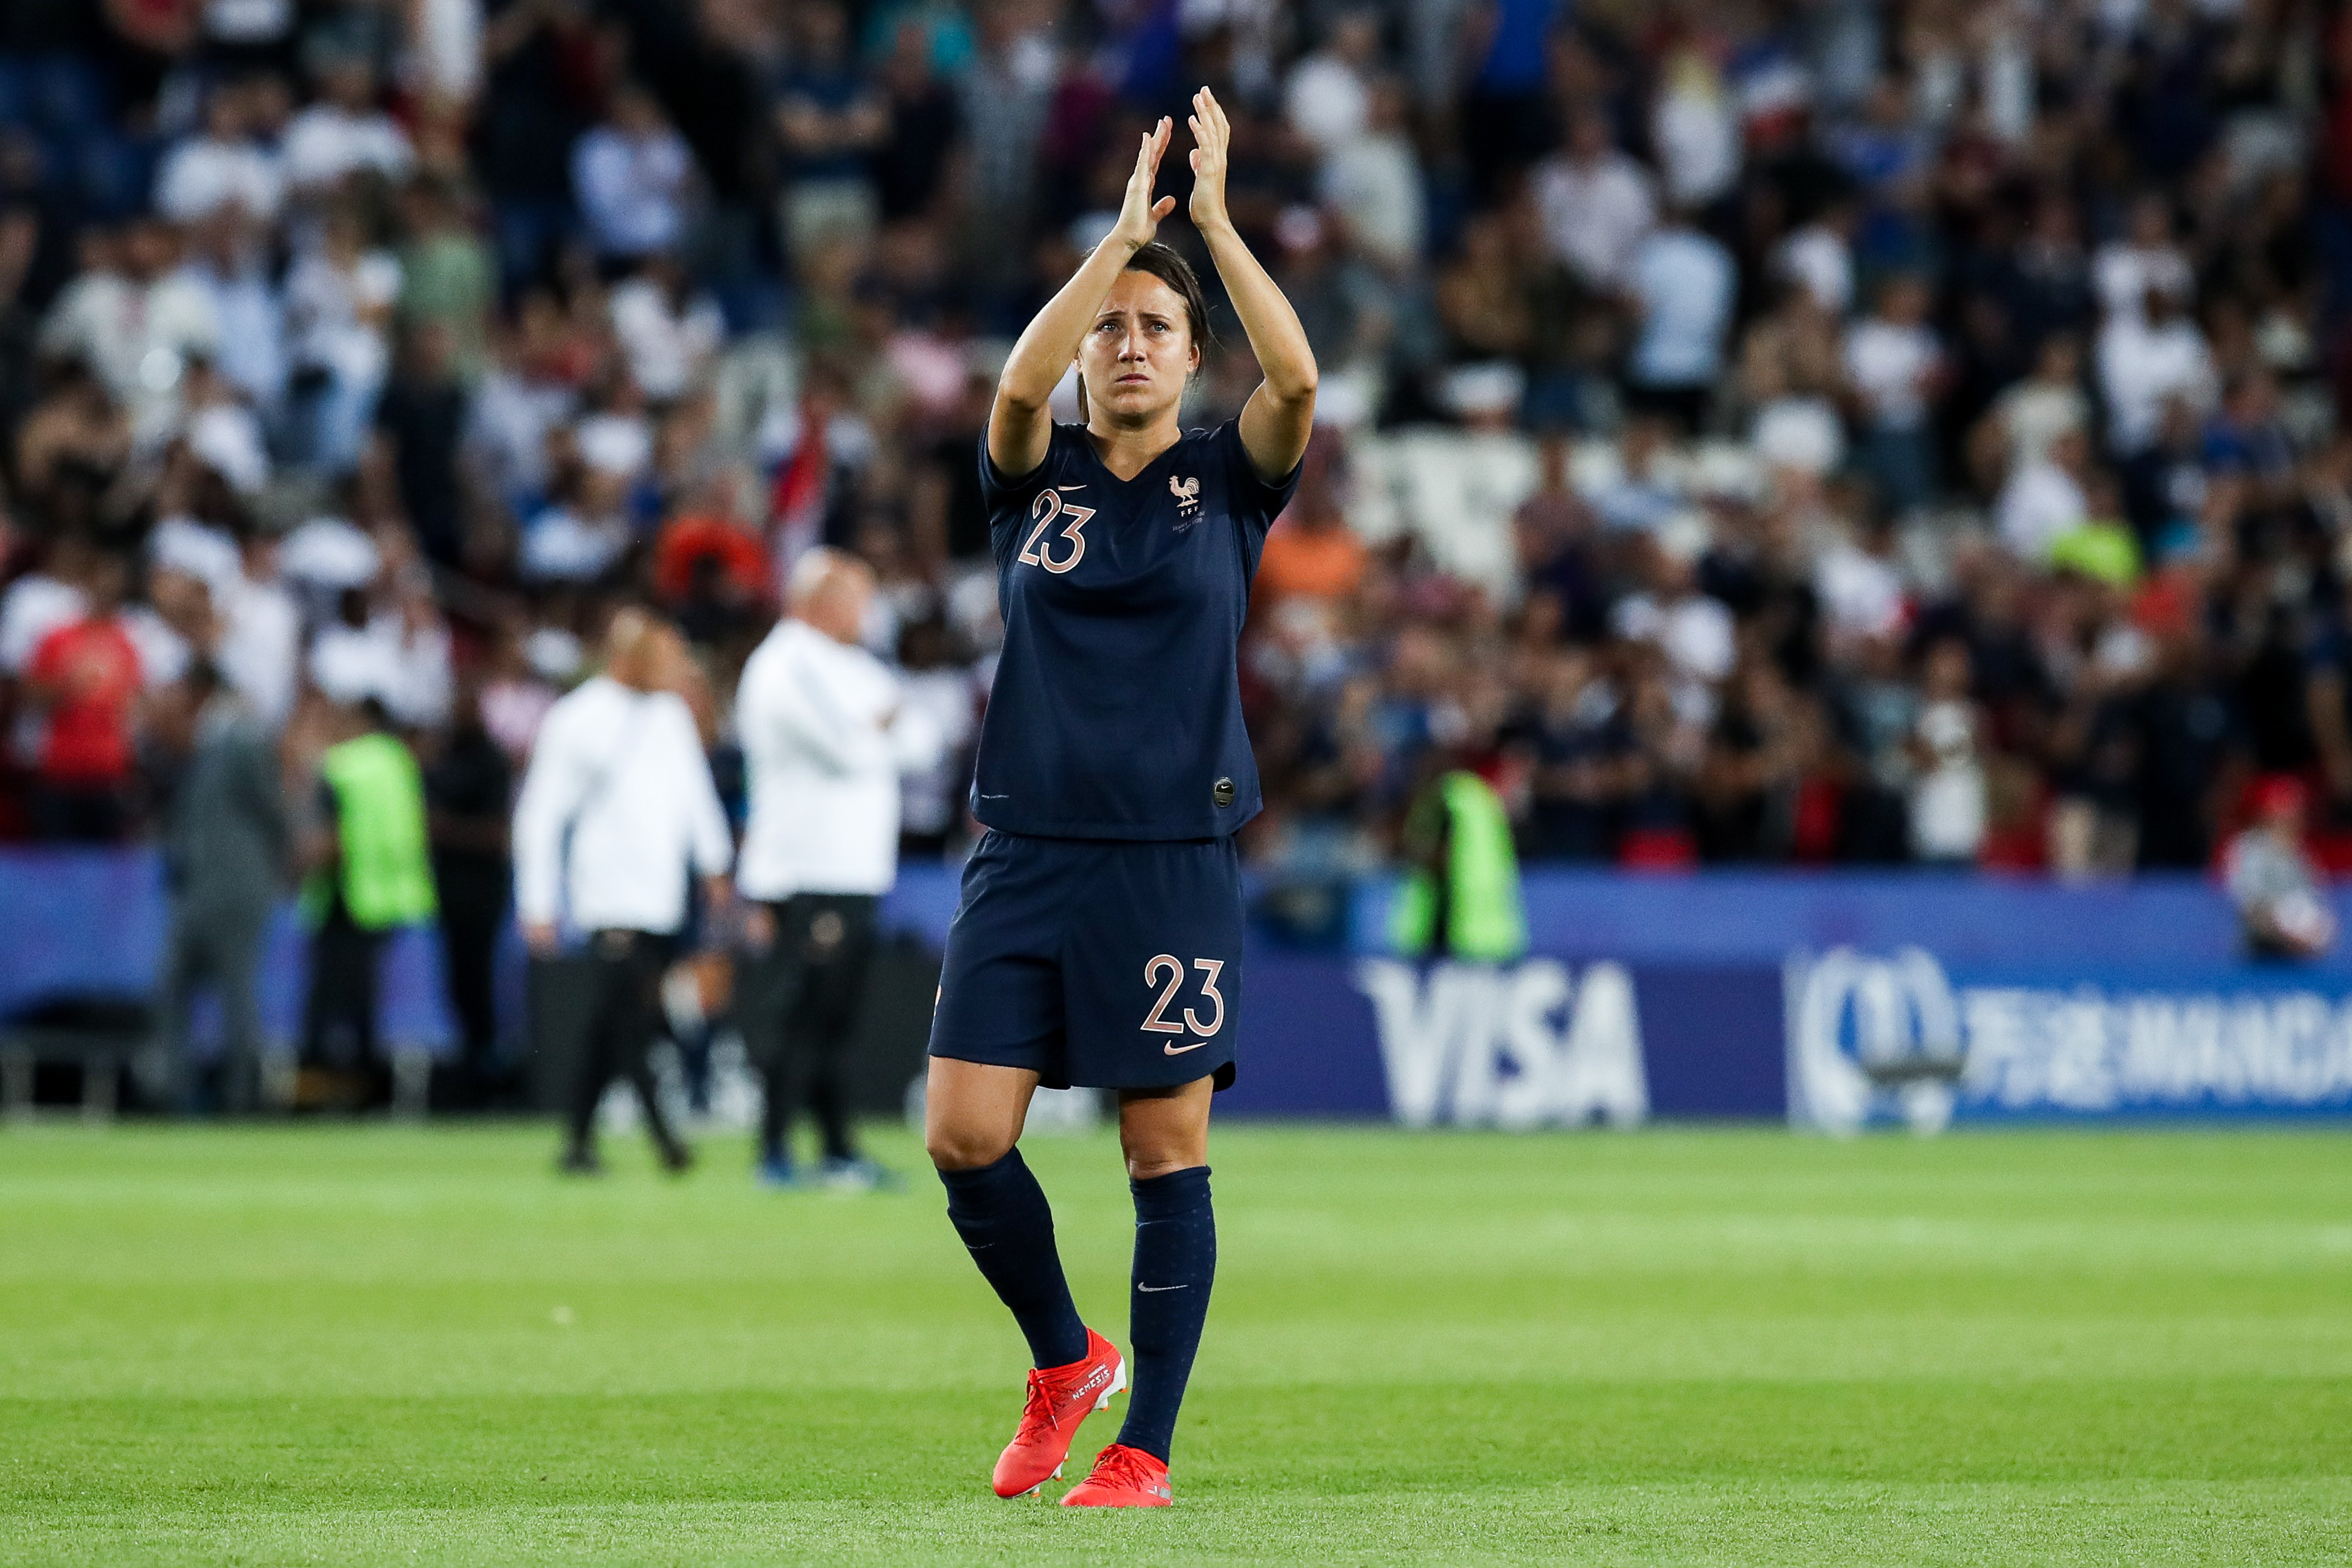 Everton Ladies sign French international